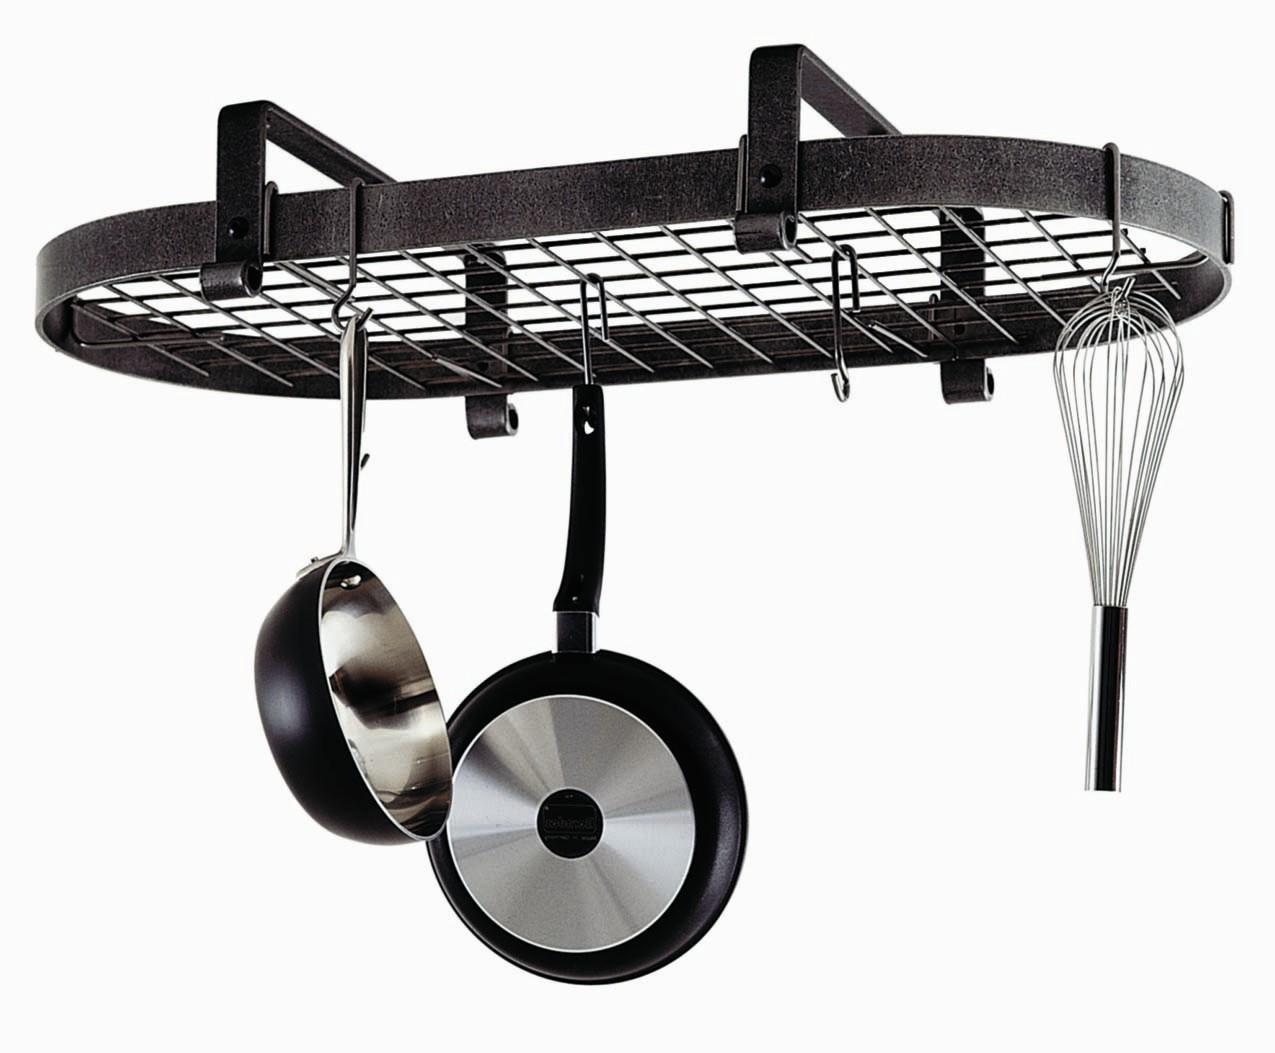 Enclume Hammered Steel Low Ceiling Oval Hanging Pot Rack